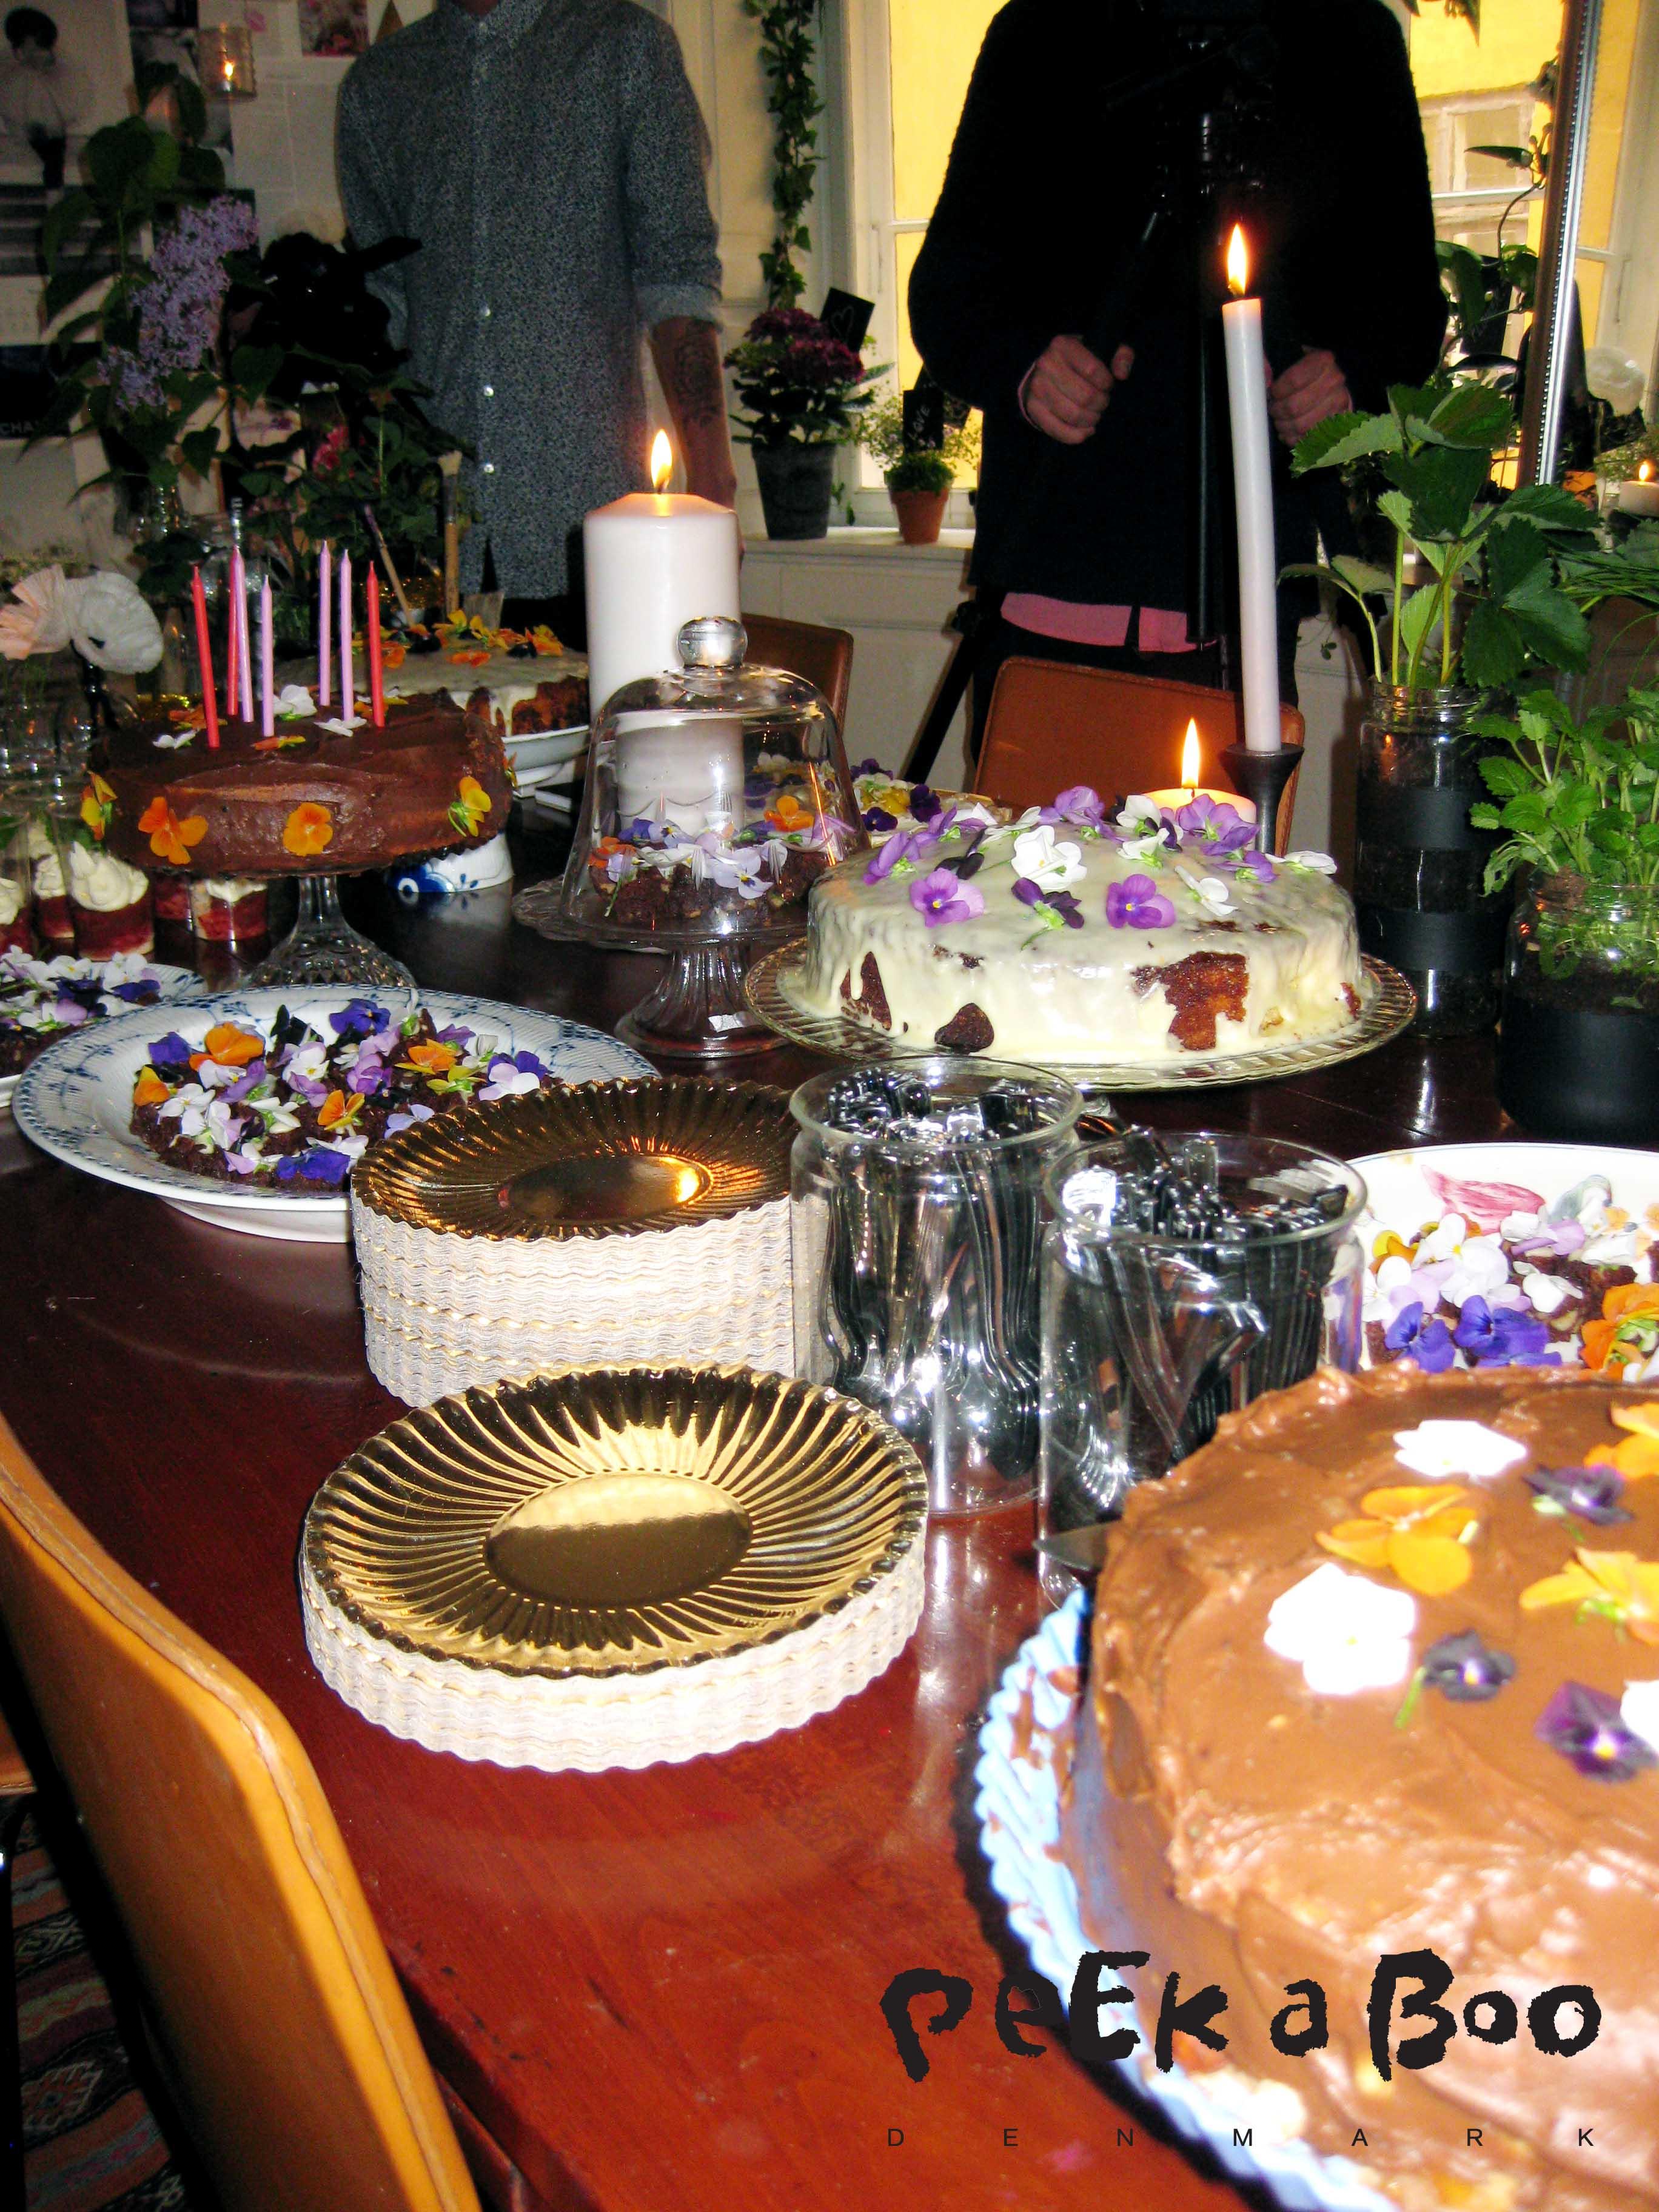 Det store ( sønderjydske) kagebord med spiselige blomster på toppen. Virkelig fint !